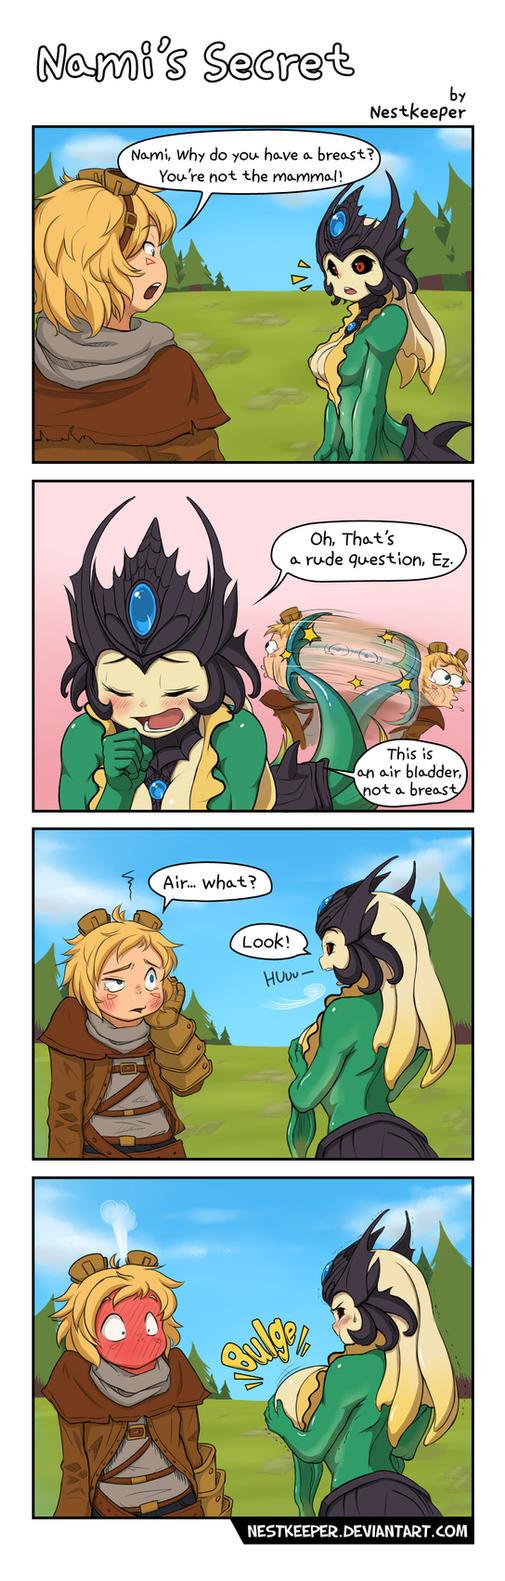 Nami's secret by Nestkeeper